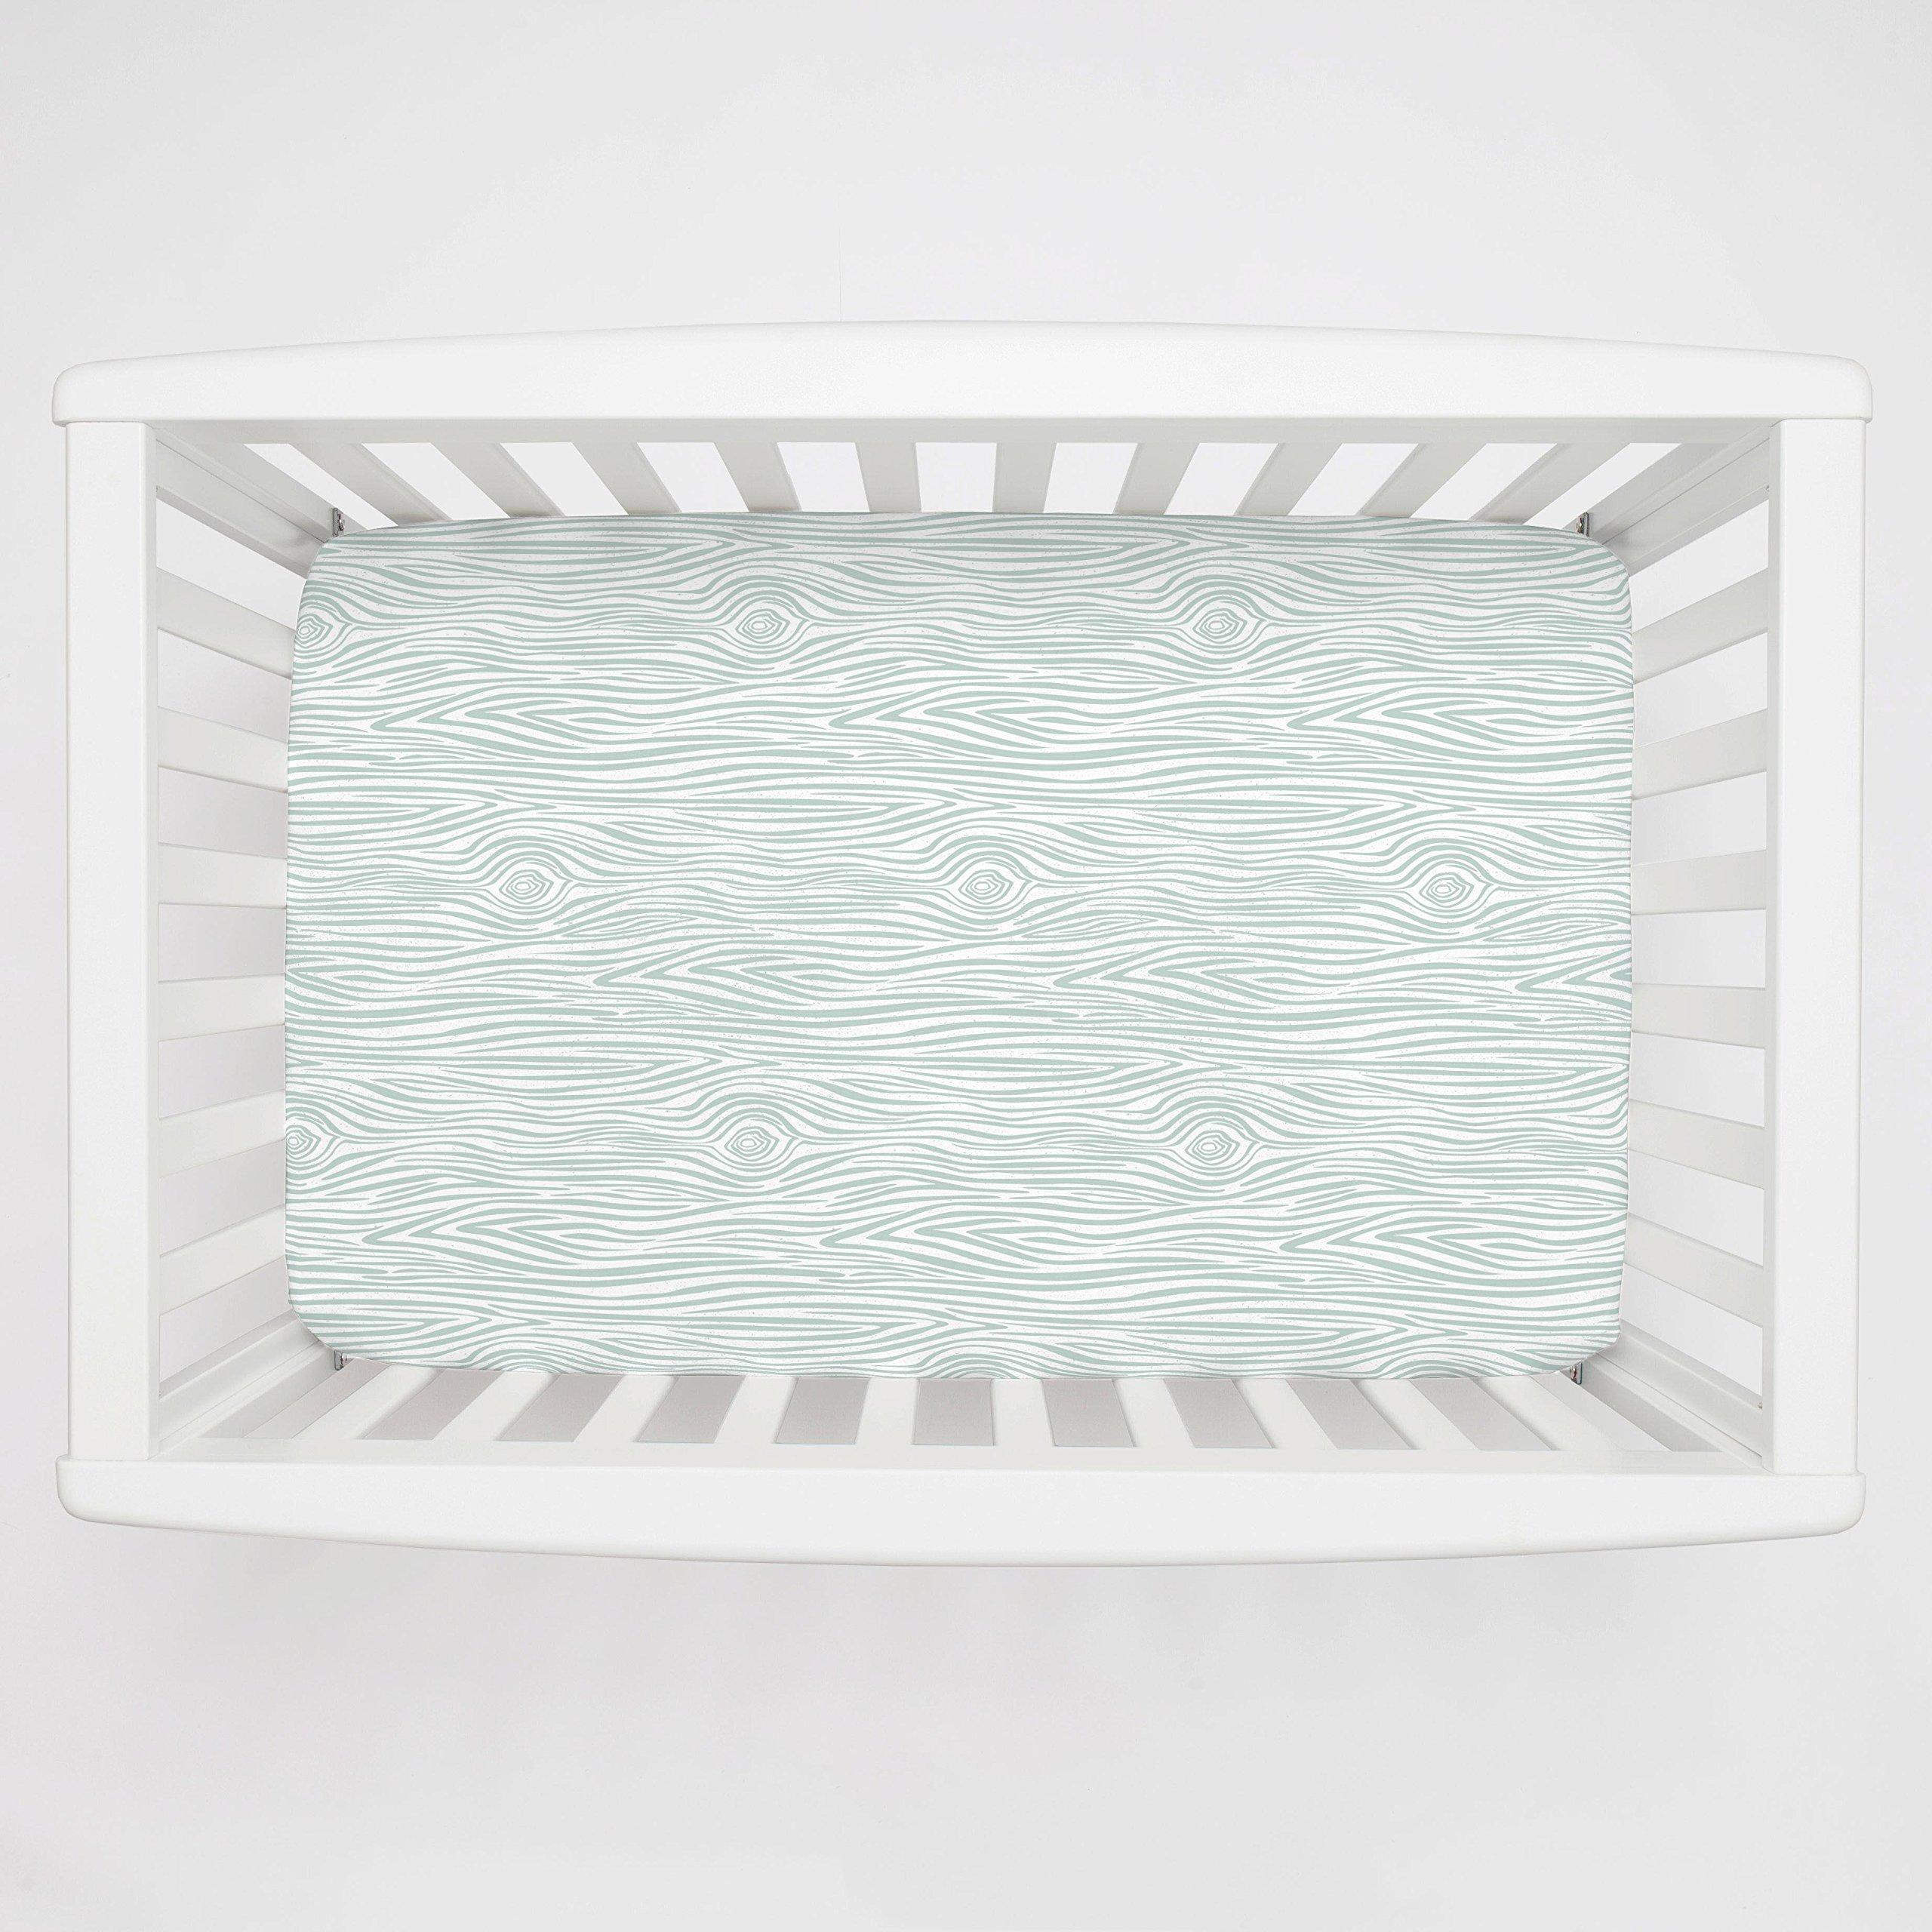 Carousel Designs Seafoam Woodgrain Mini Crib Sheet 5-Inch-6-Inch Depth - Organic 100% Cotton Fitted Mini Crib Sheet - Made in The USA